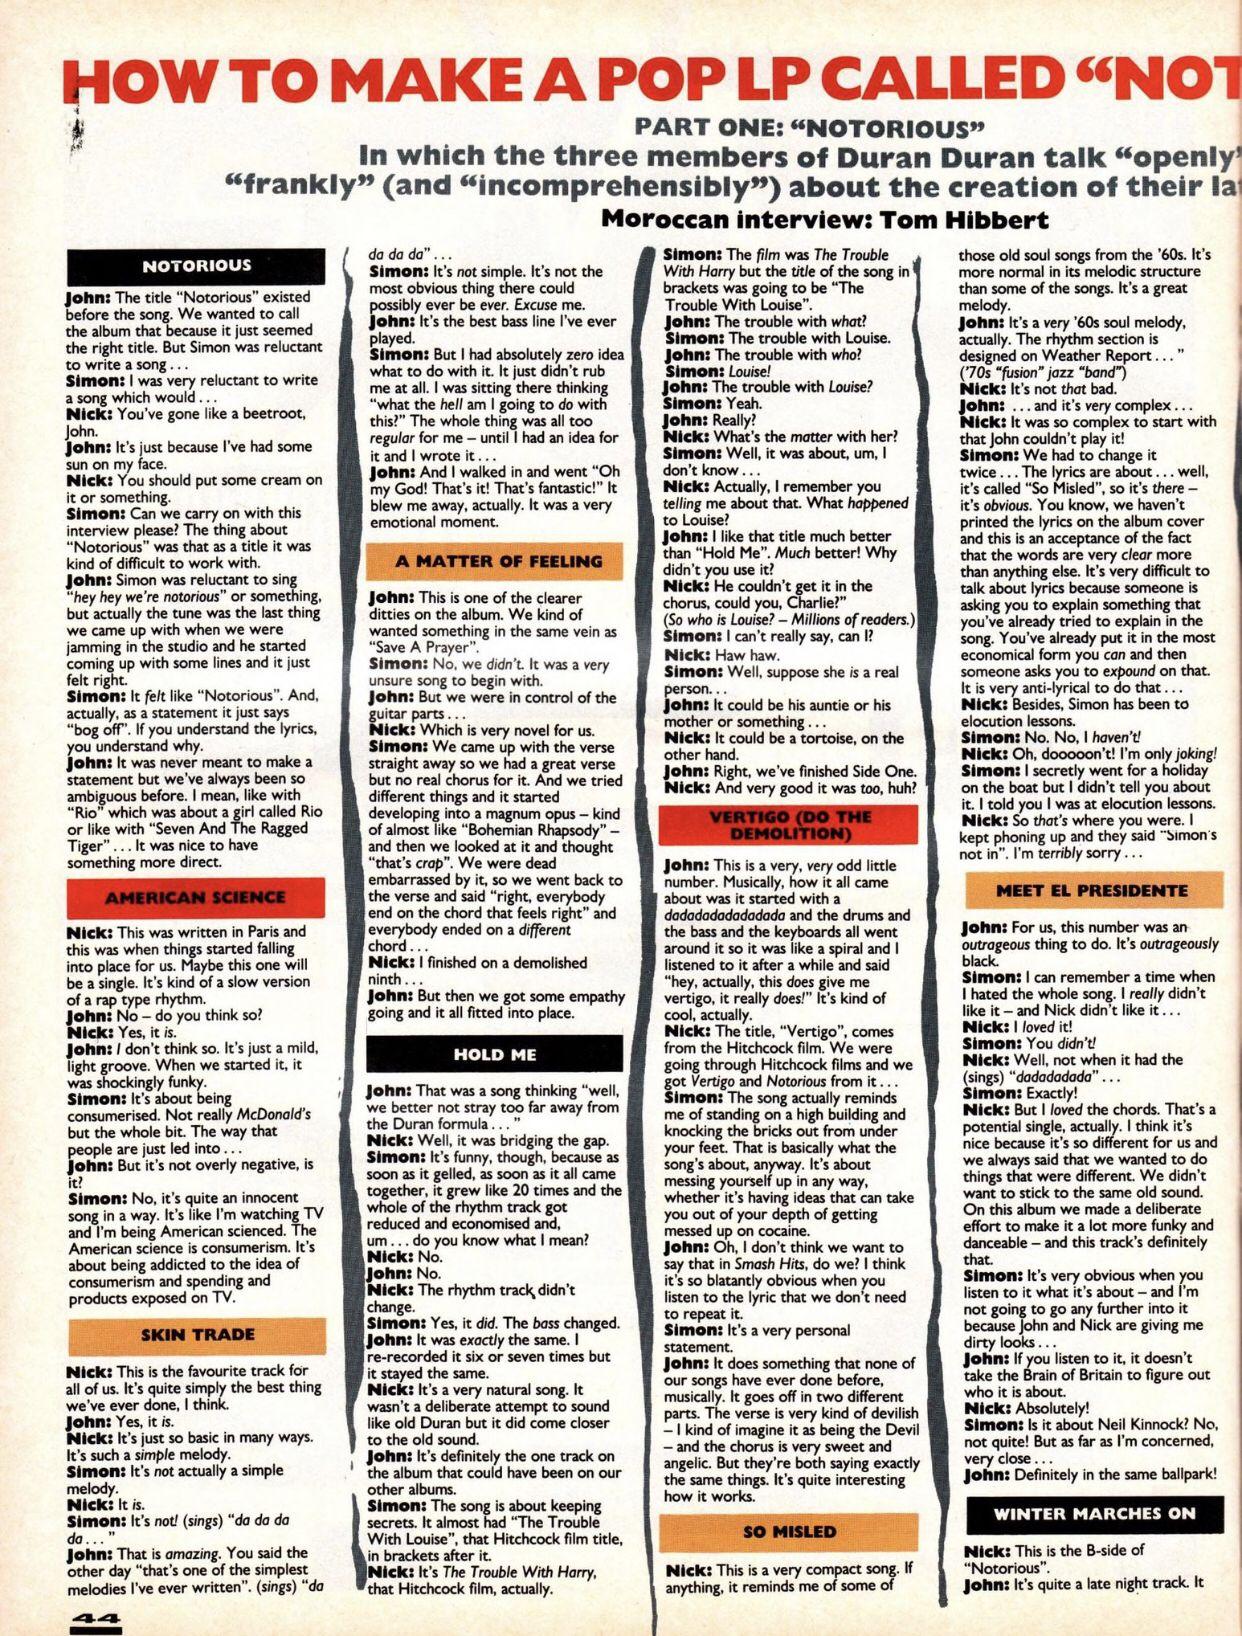 Pin By Barnaby Dickenson On Barn S 80s Pop Duran Pop 80s Pop